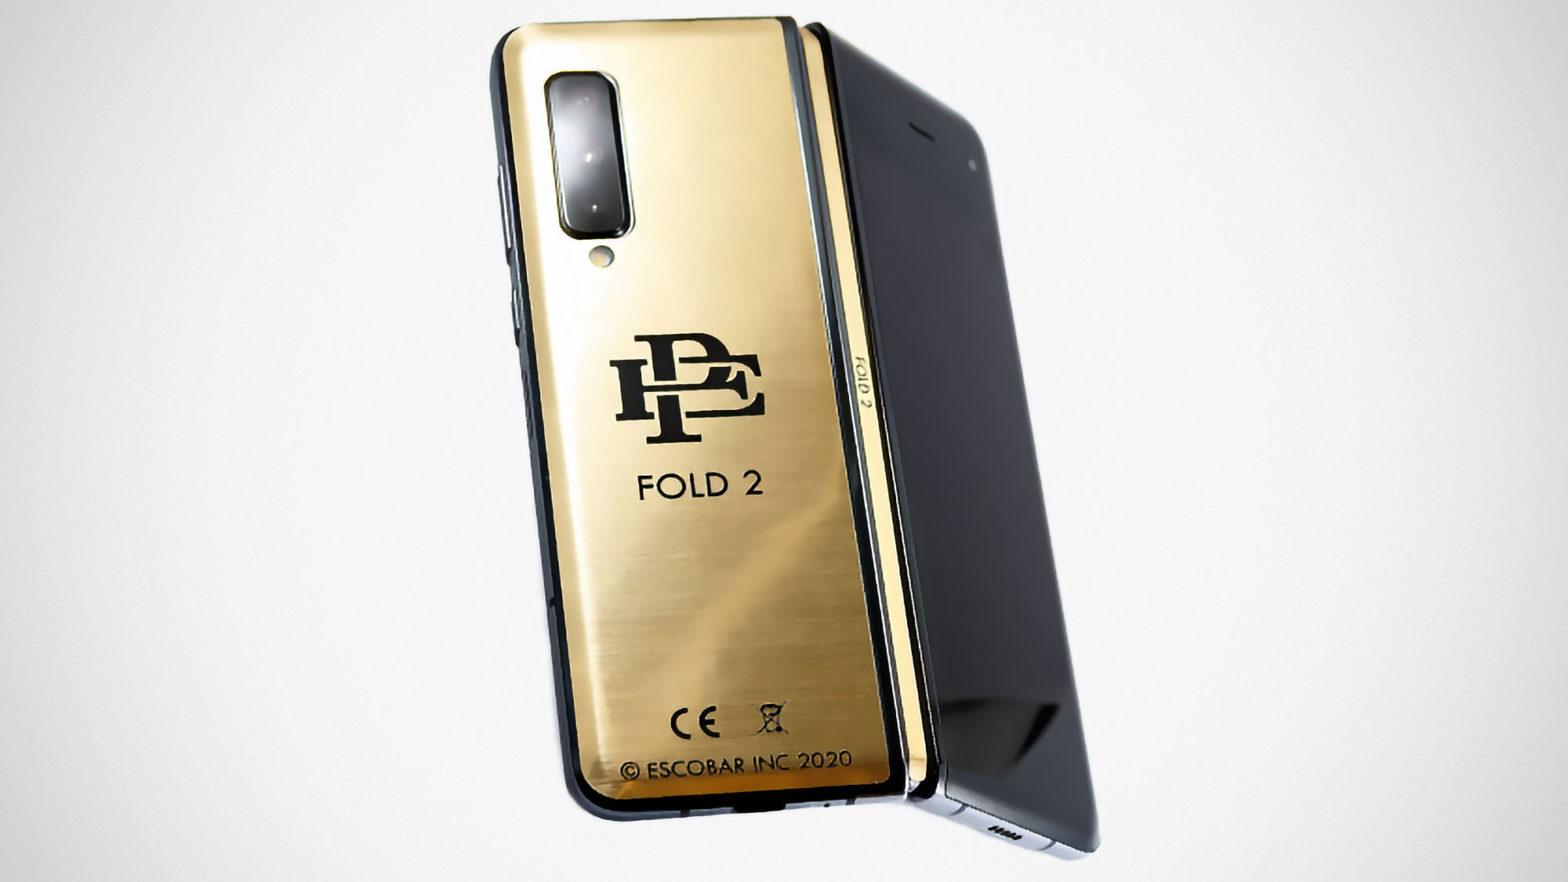 Escobar Fold 2 Folding Smartphone